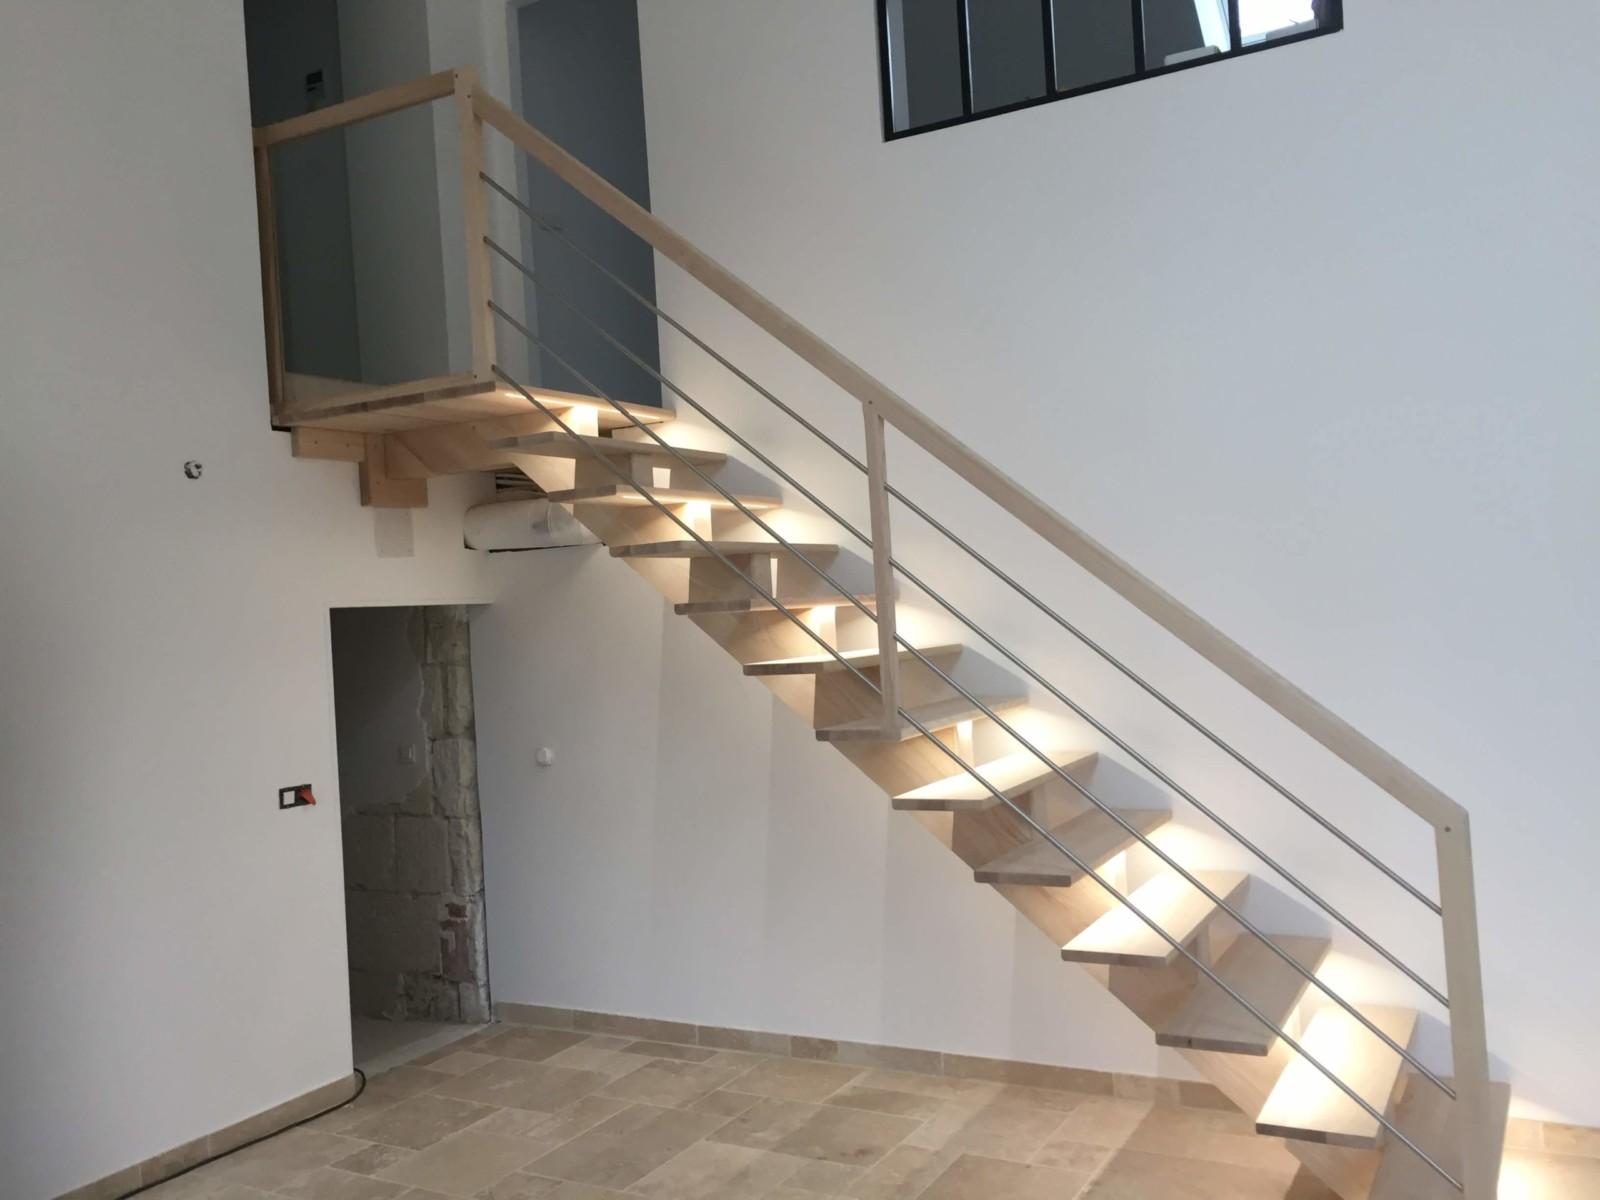 REGIS BERTHELOT Fabricant Escaliers Longue Jumelles IMG 0924 2